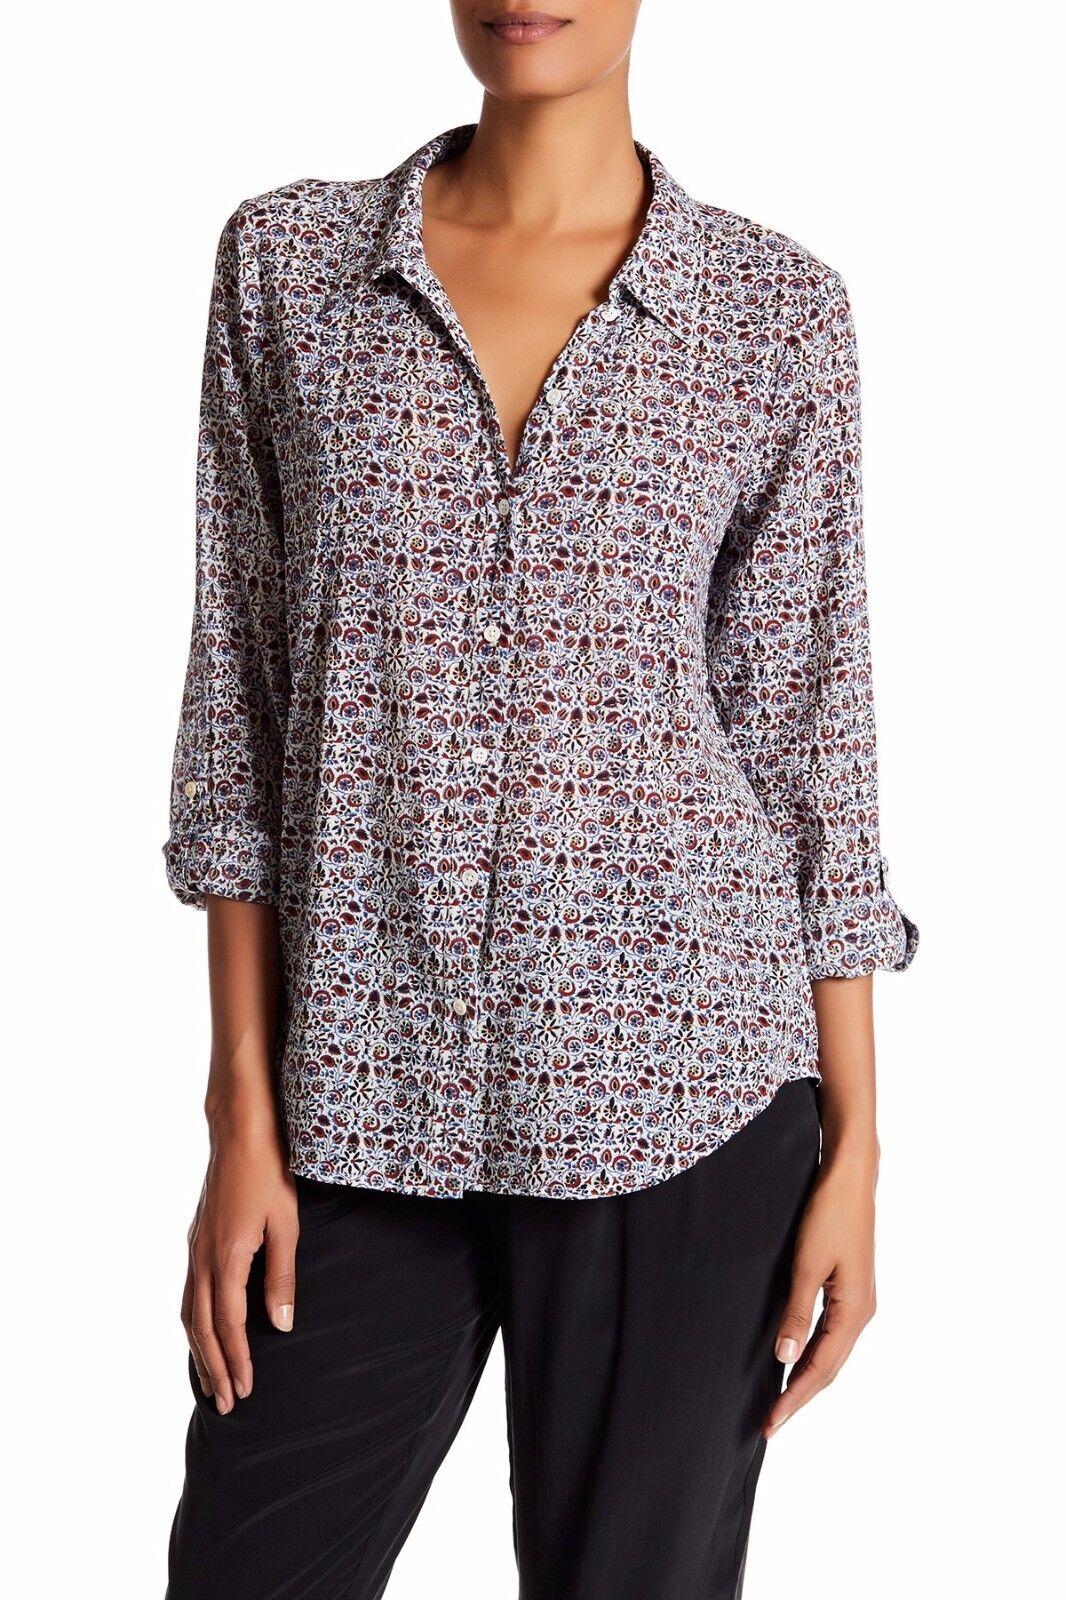 NWT  Joie Katrine  Printed Long Sleeves Blouse Cotton Shirt Größe Medium M